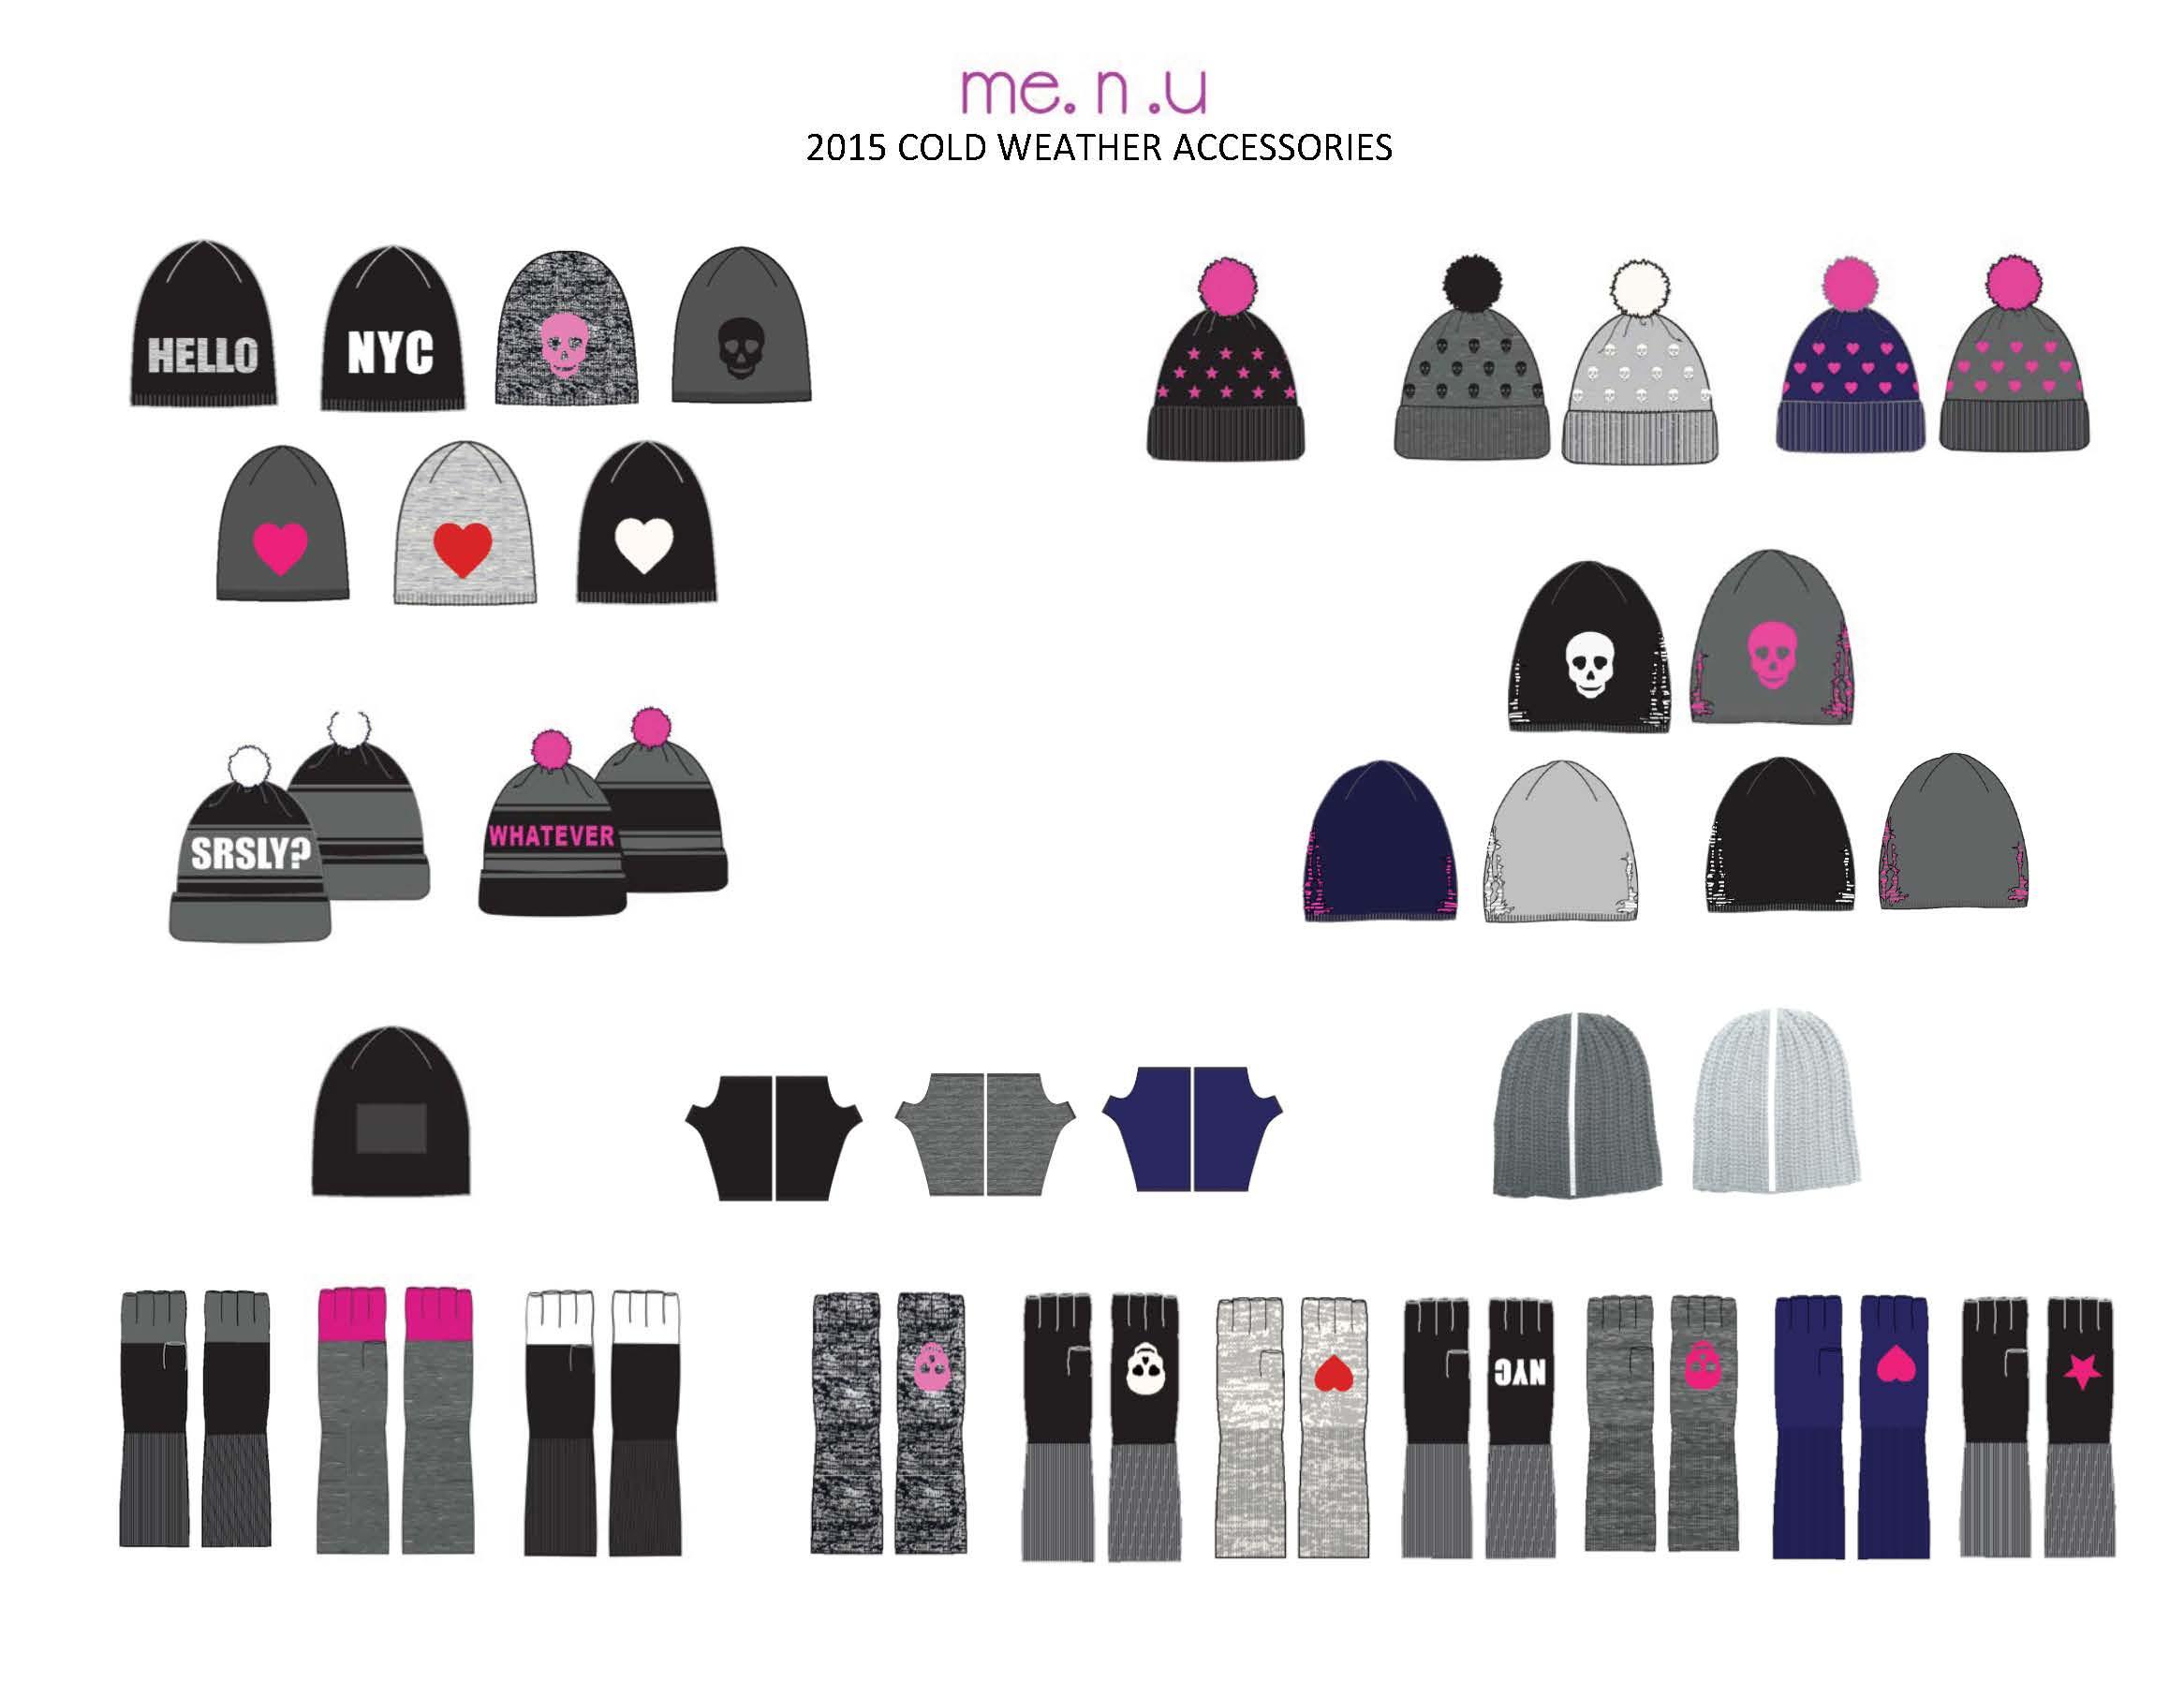 Me.n.u 2015 Cold Weather Accessories